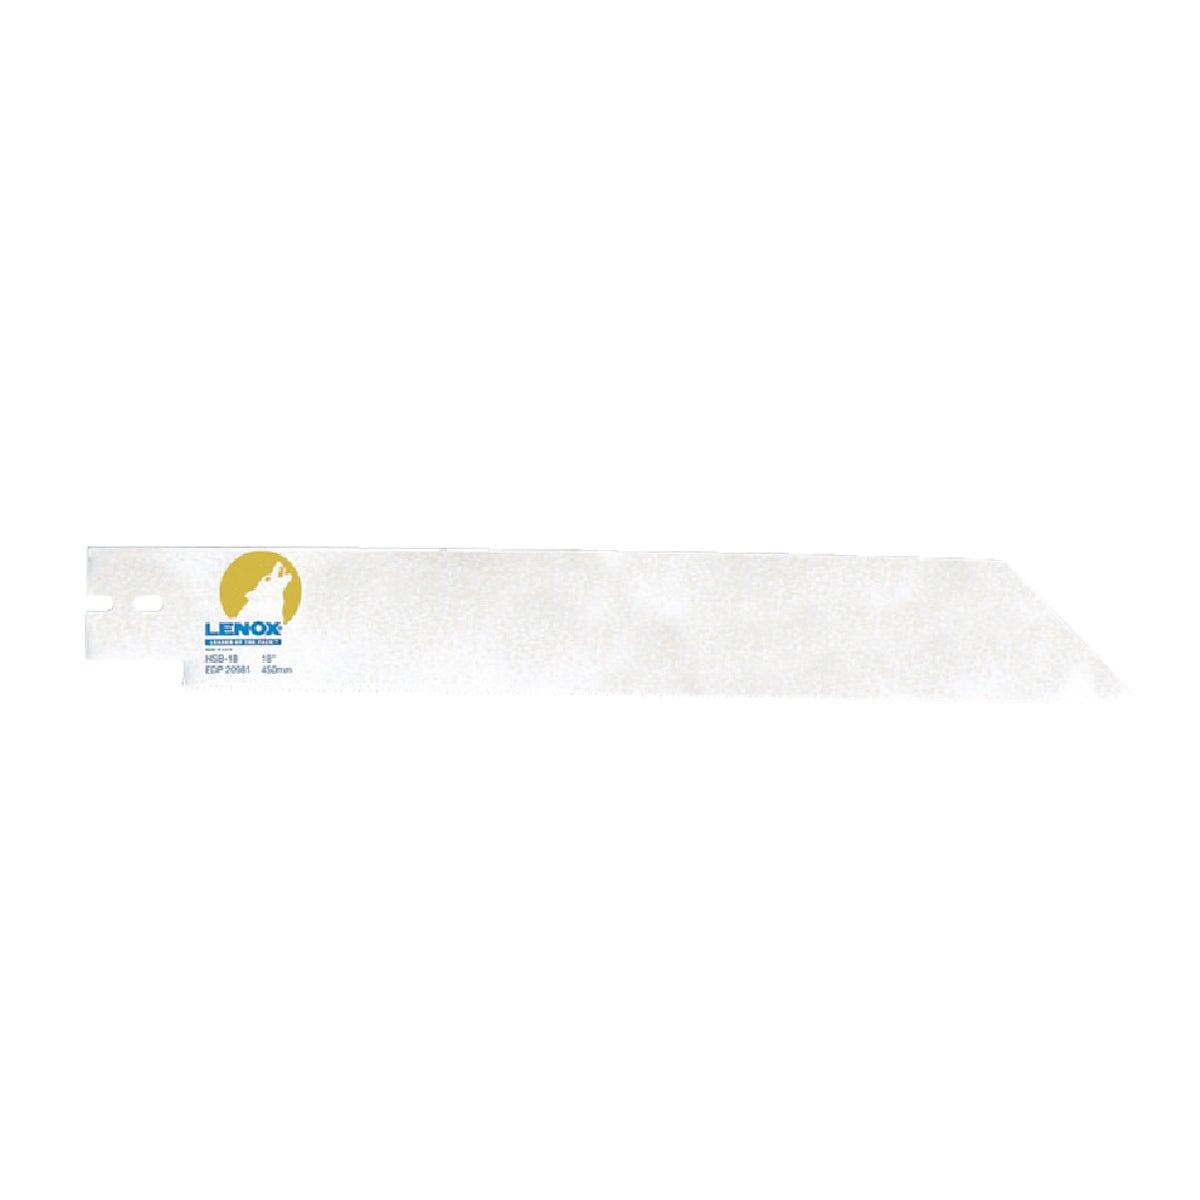 PVC/ABS BLADE - HSB-18 by Lenox